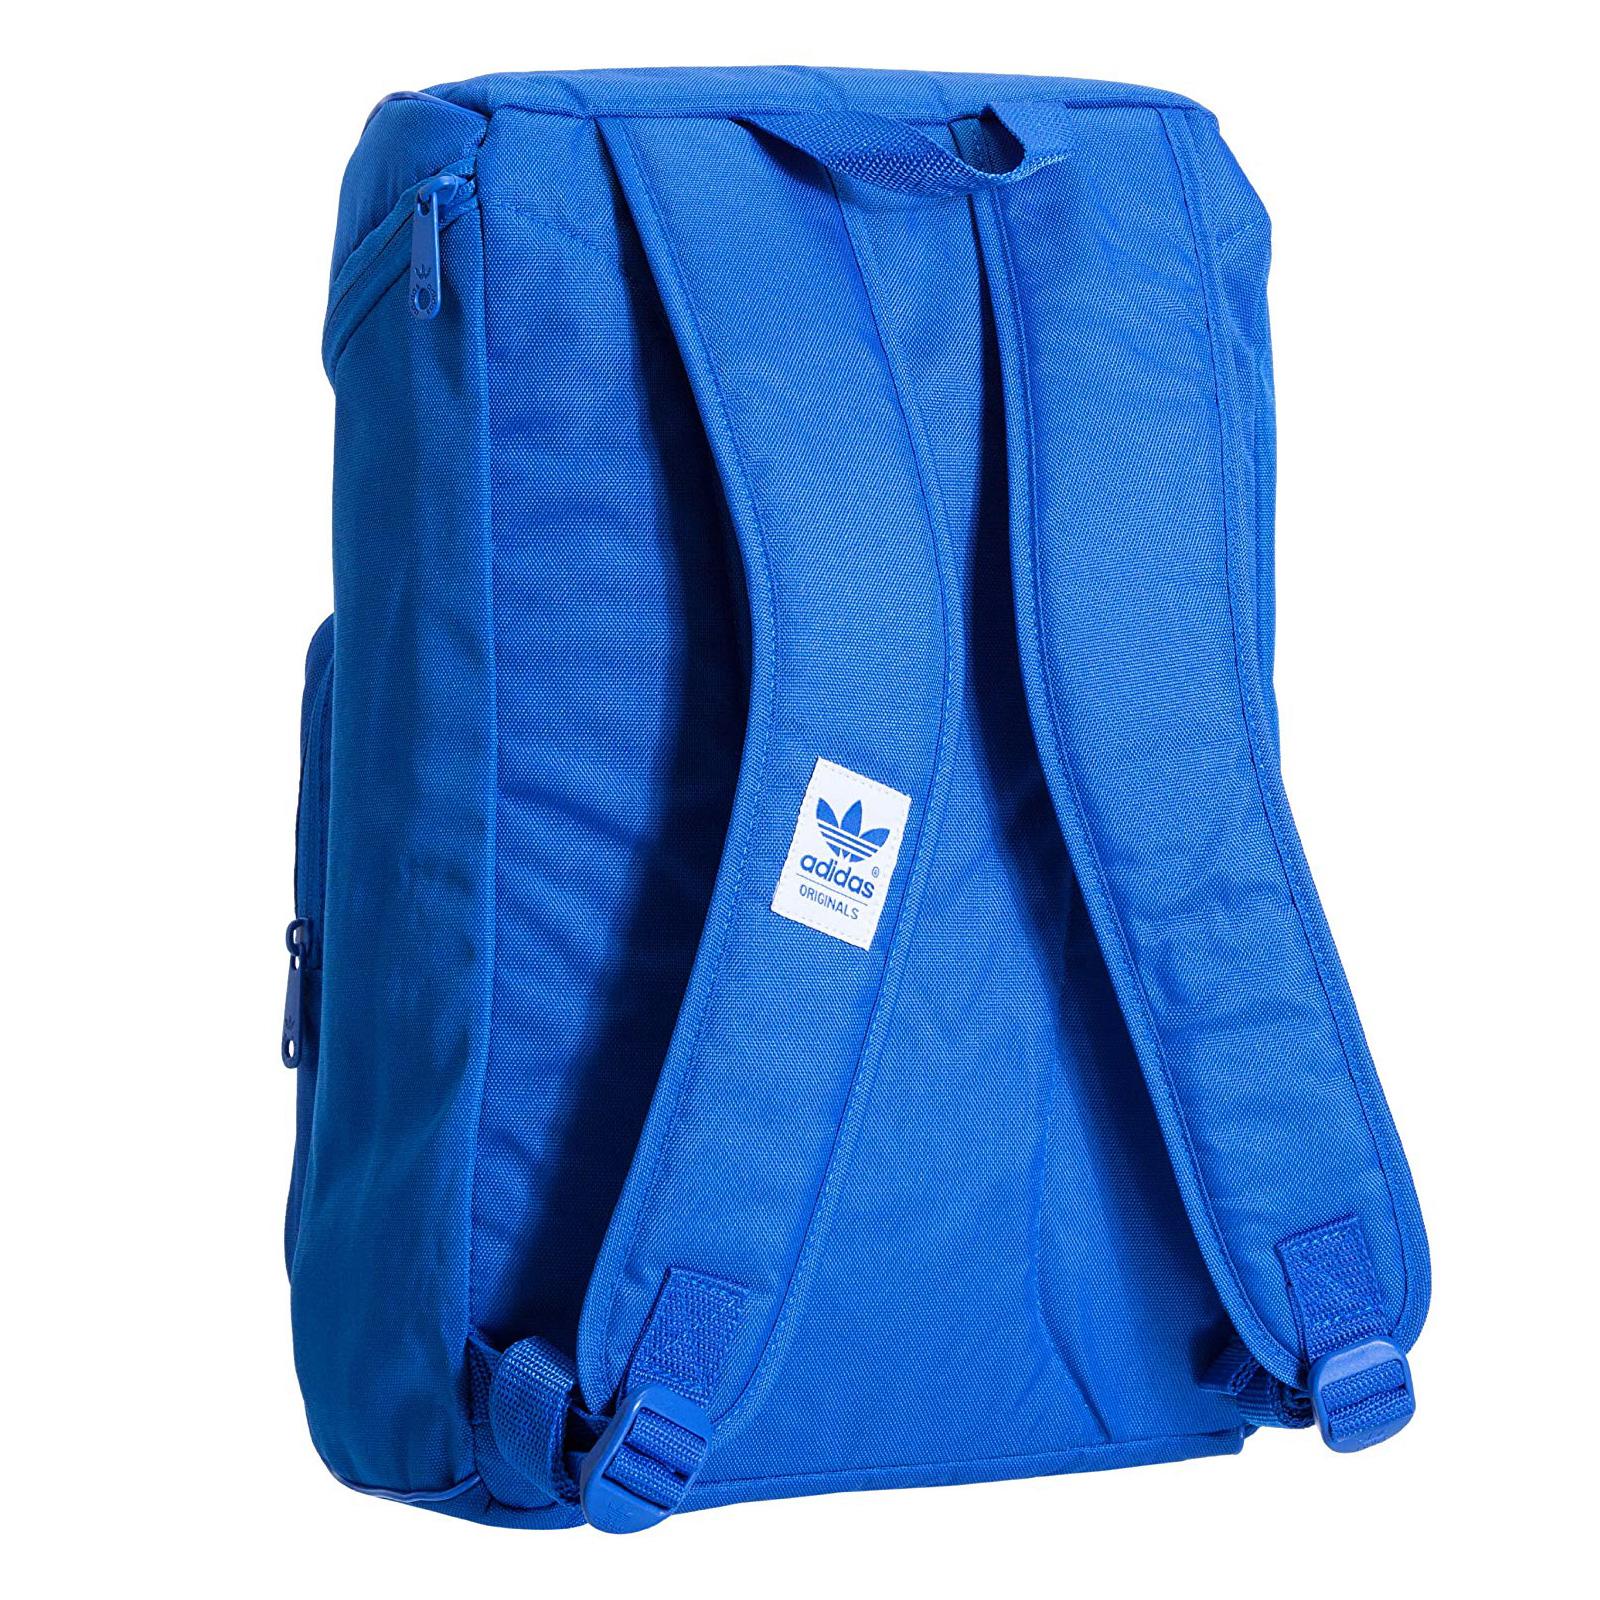 f0ece7574d2a8 adidas Originals Classic Trefoil Backpack Rucksack Freizeit Schule ...